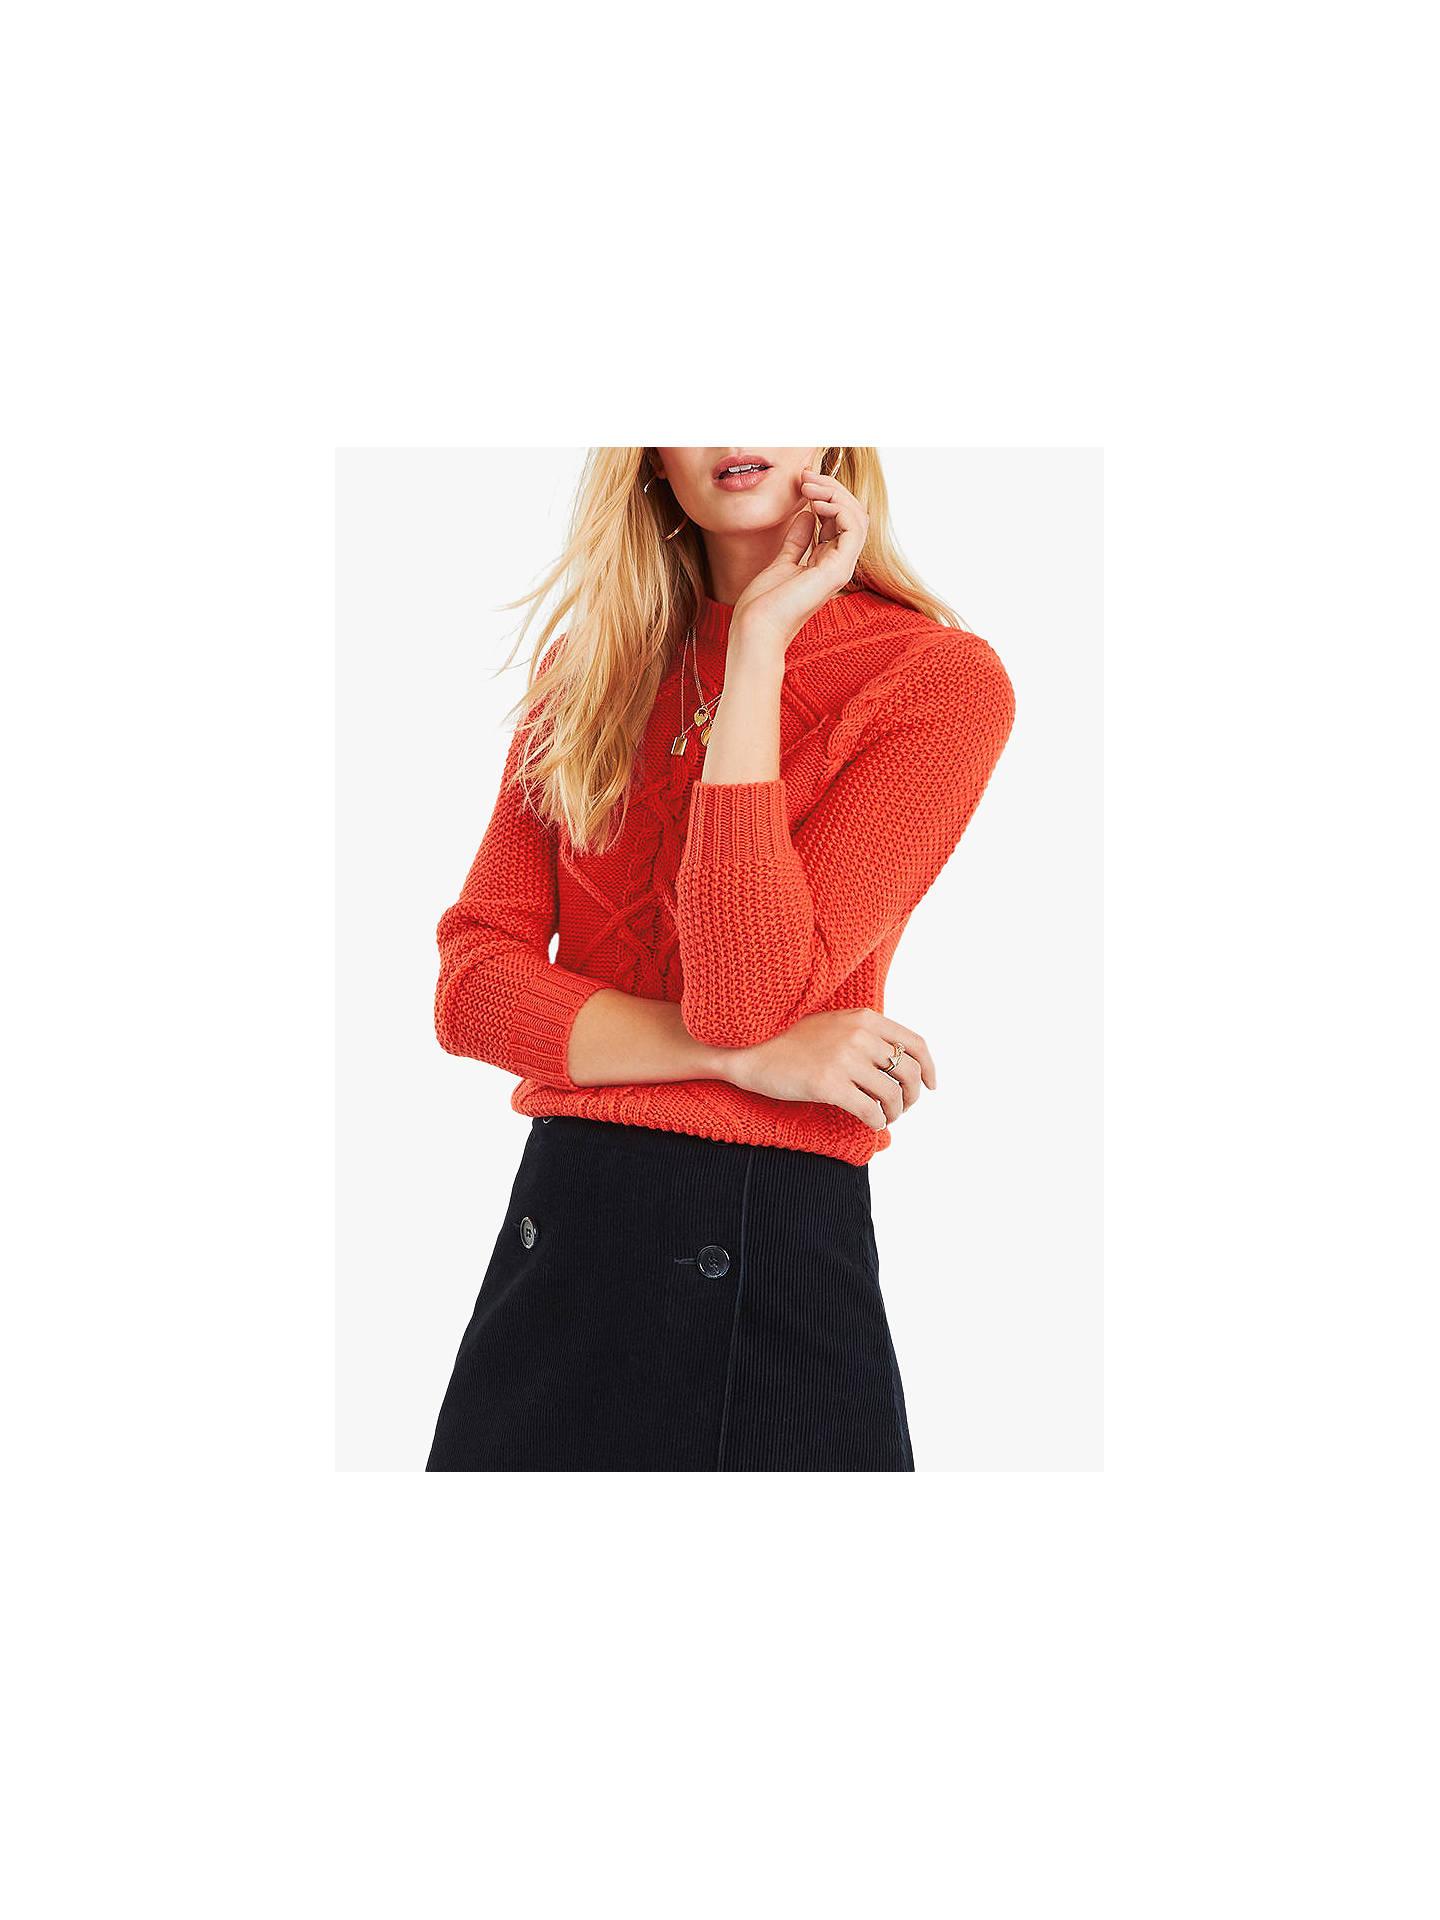 df9bc1b67178 Buy Oasis Nyla Cable Knit Jumper, Bright Orange, S Online at johnlewis.com  ...